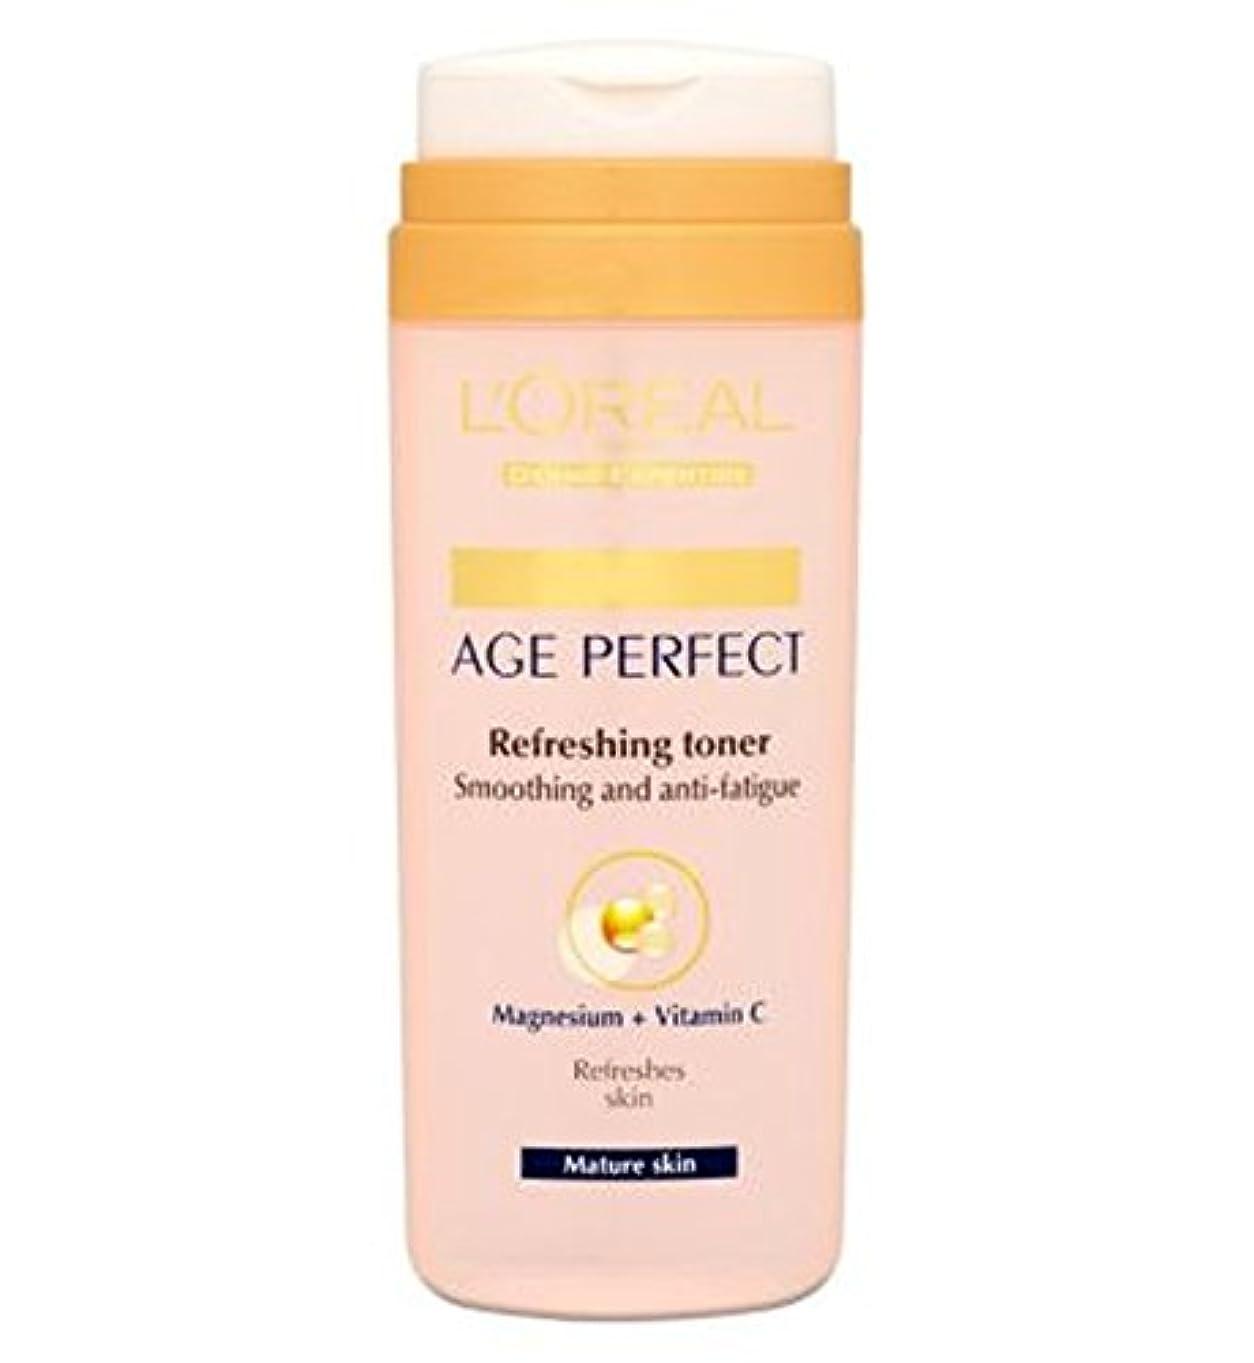 L'Oreallパリ真皮専門知識の年齢、完璧なさわやかなトナー成熟肌の200ミリリットル (L'Oreal) (x2) - L'Oreall Paris Dermo-Expertise Age Perfect Refreshing Toner Mature Skin 200ml (Pack of 2) [並行輸入品]